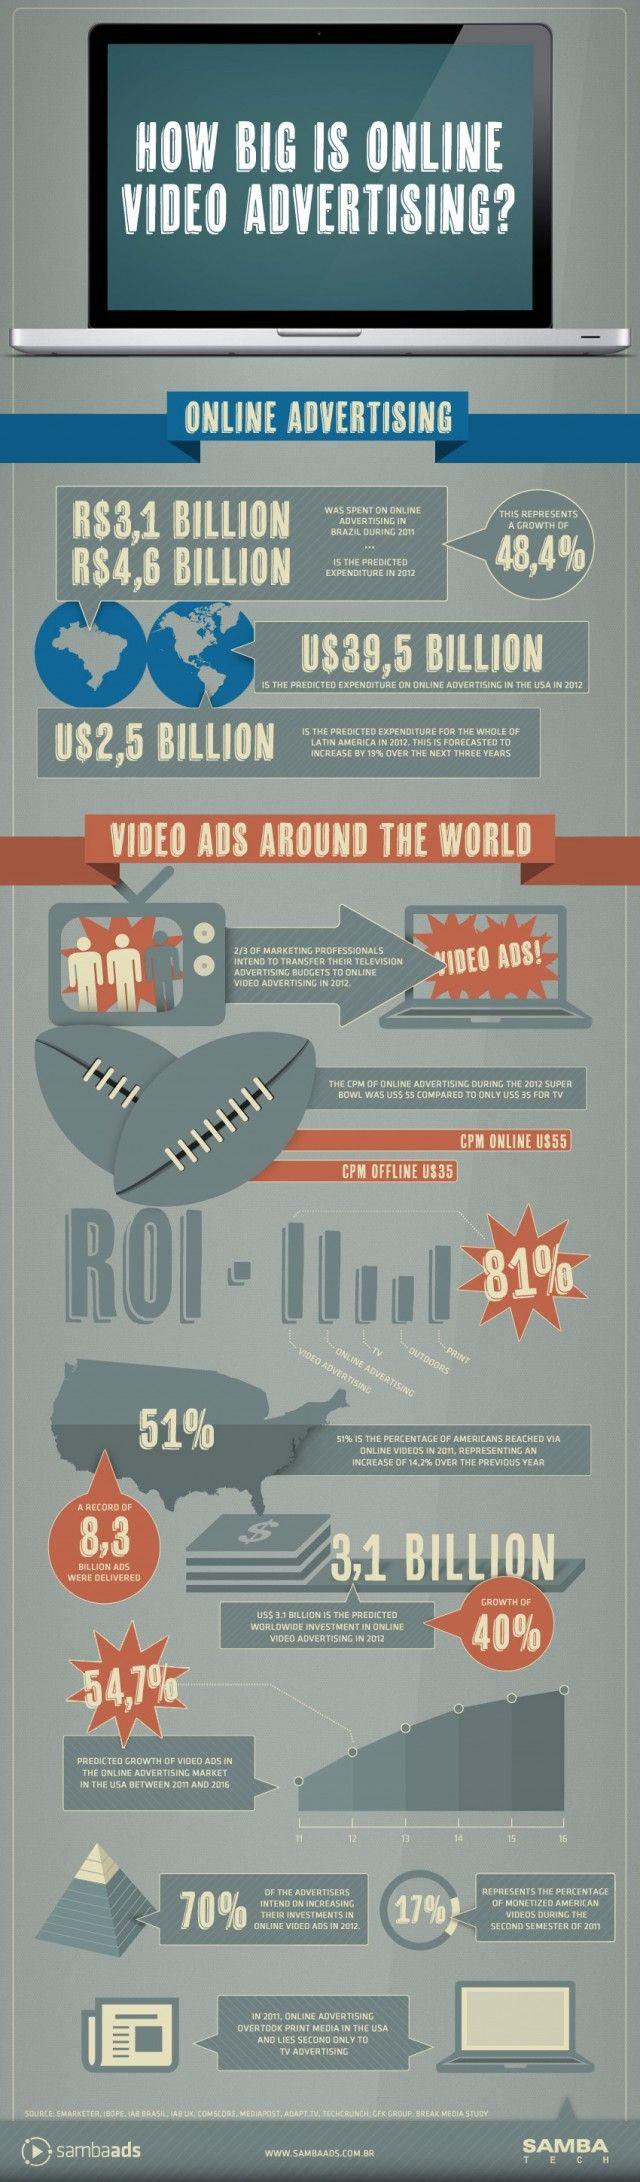 How Big Is Online Video Advertising? - Ashu Rajdor